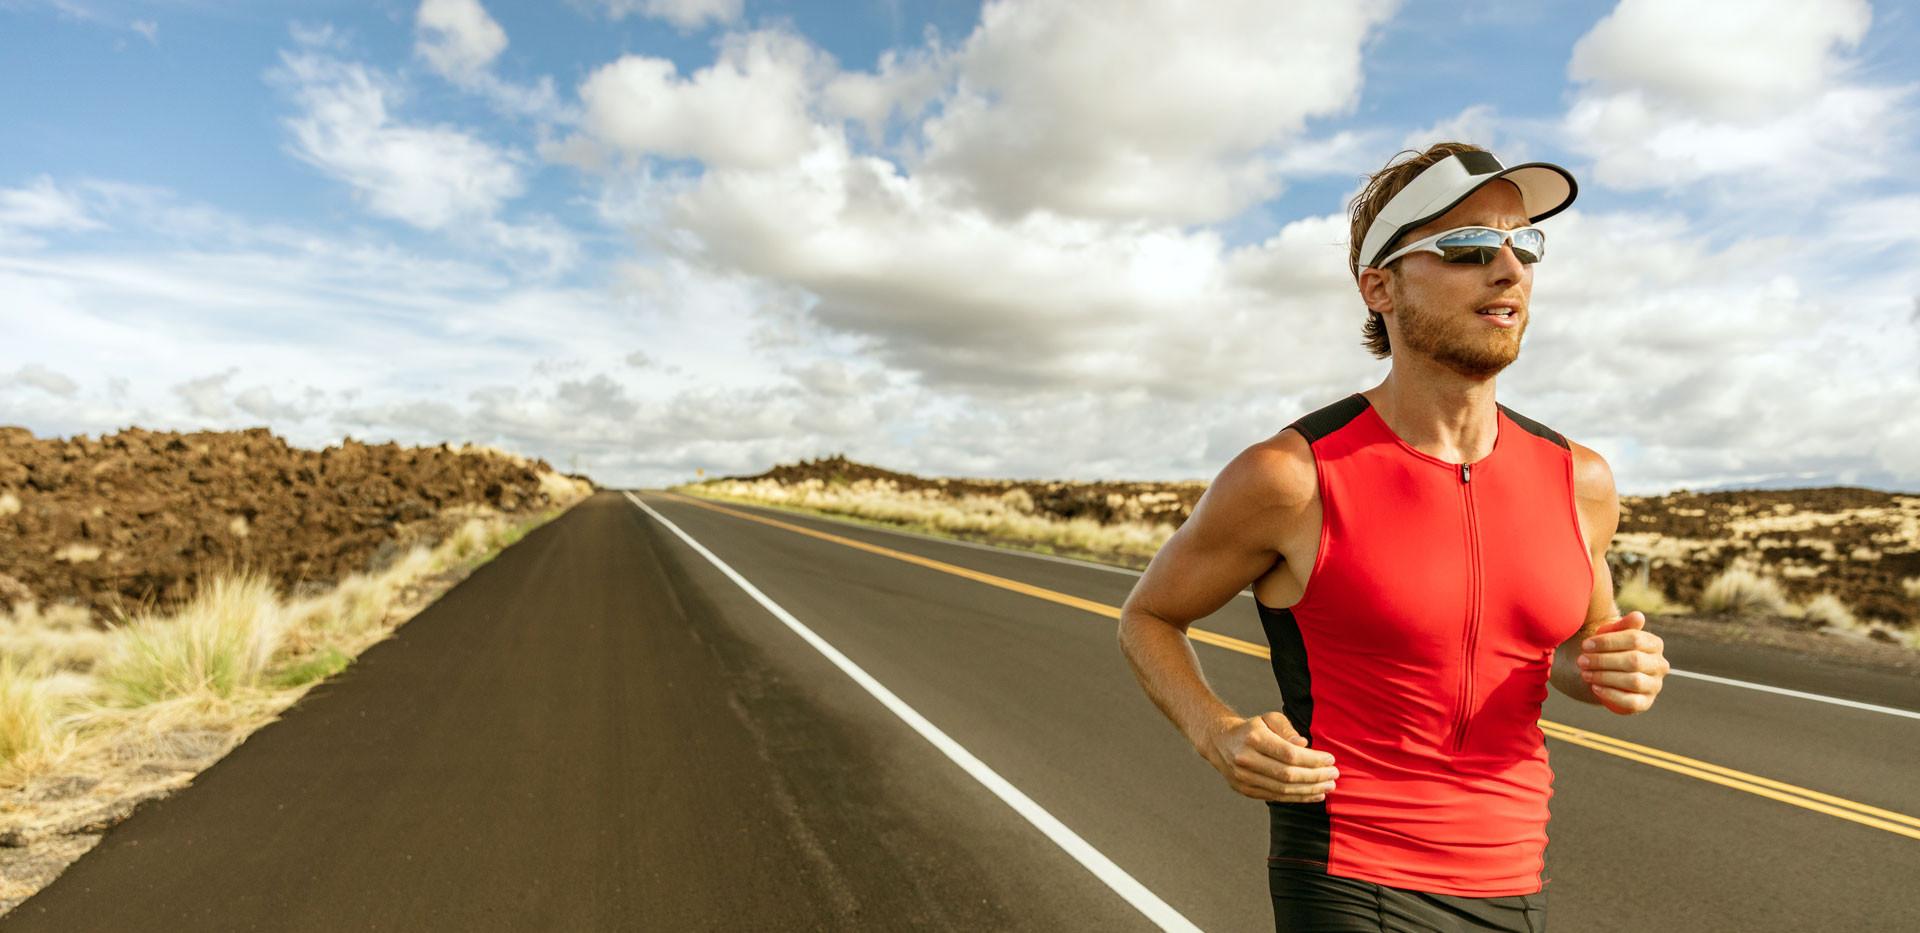 Jogging Sports Glasses